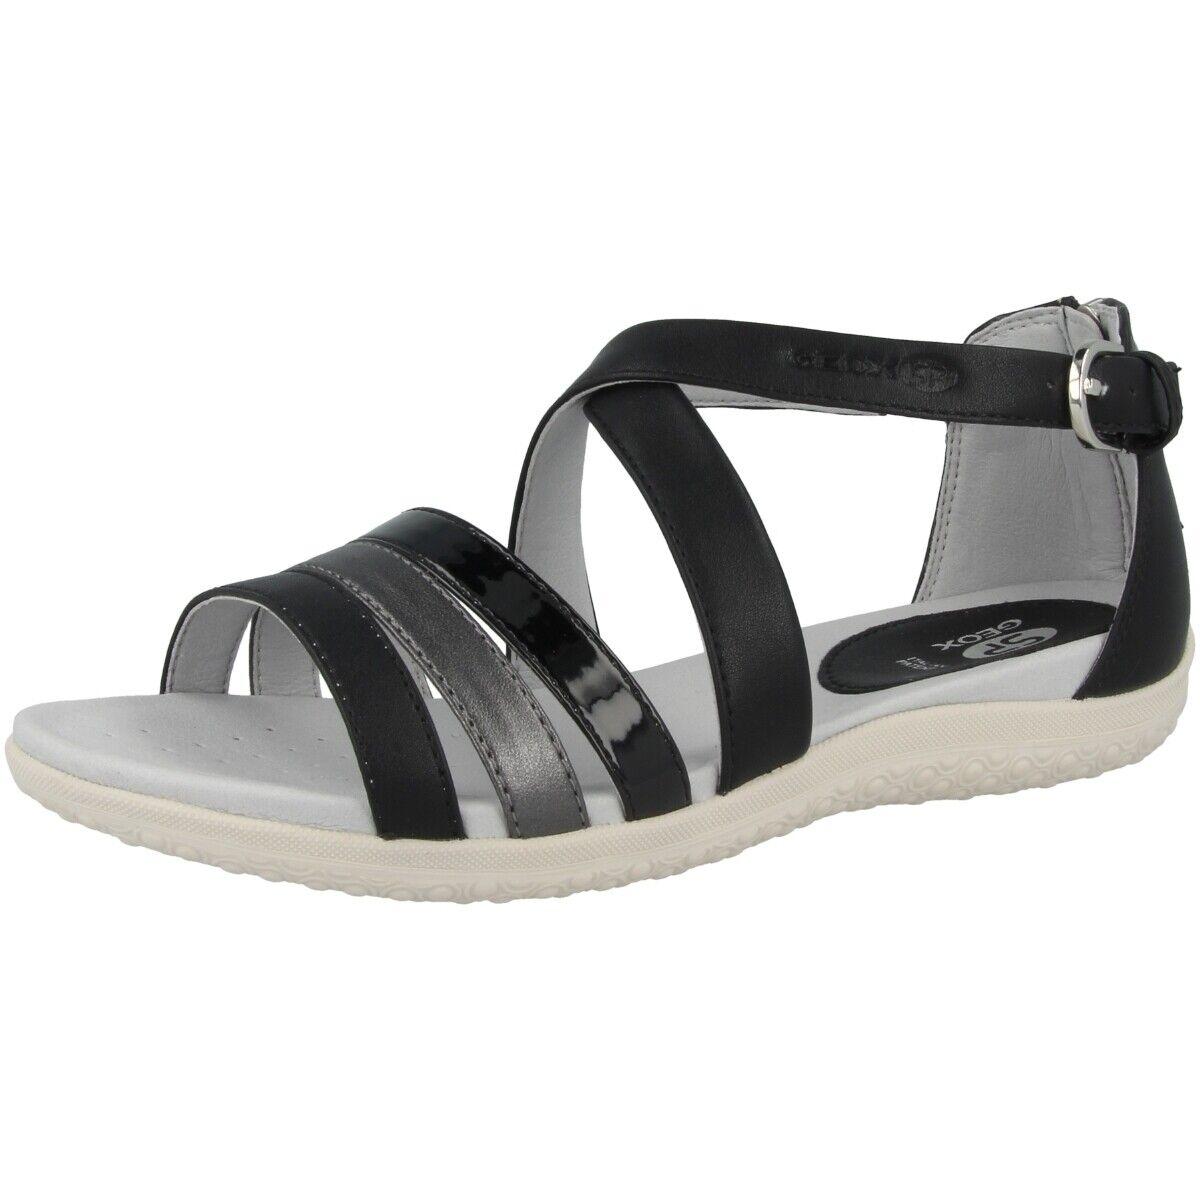 Geox D Sand. Vega B shoes Womens Sandals Outdoor Ankle-Strap D92R6B054AJC0005